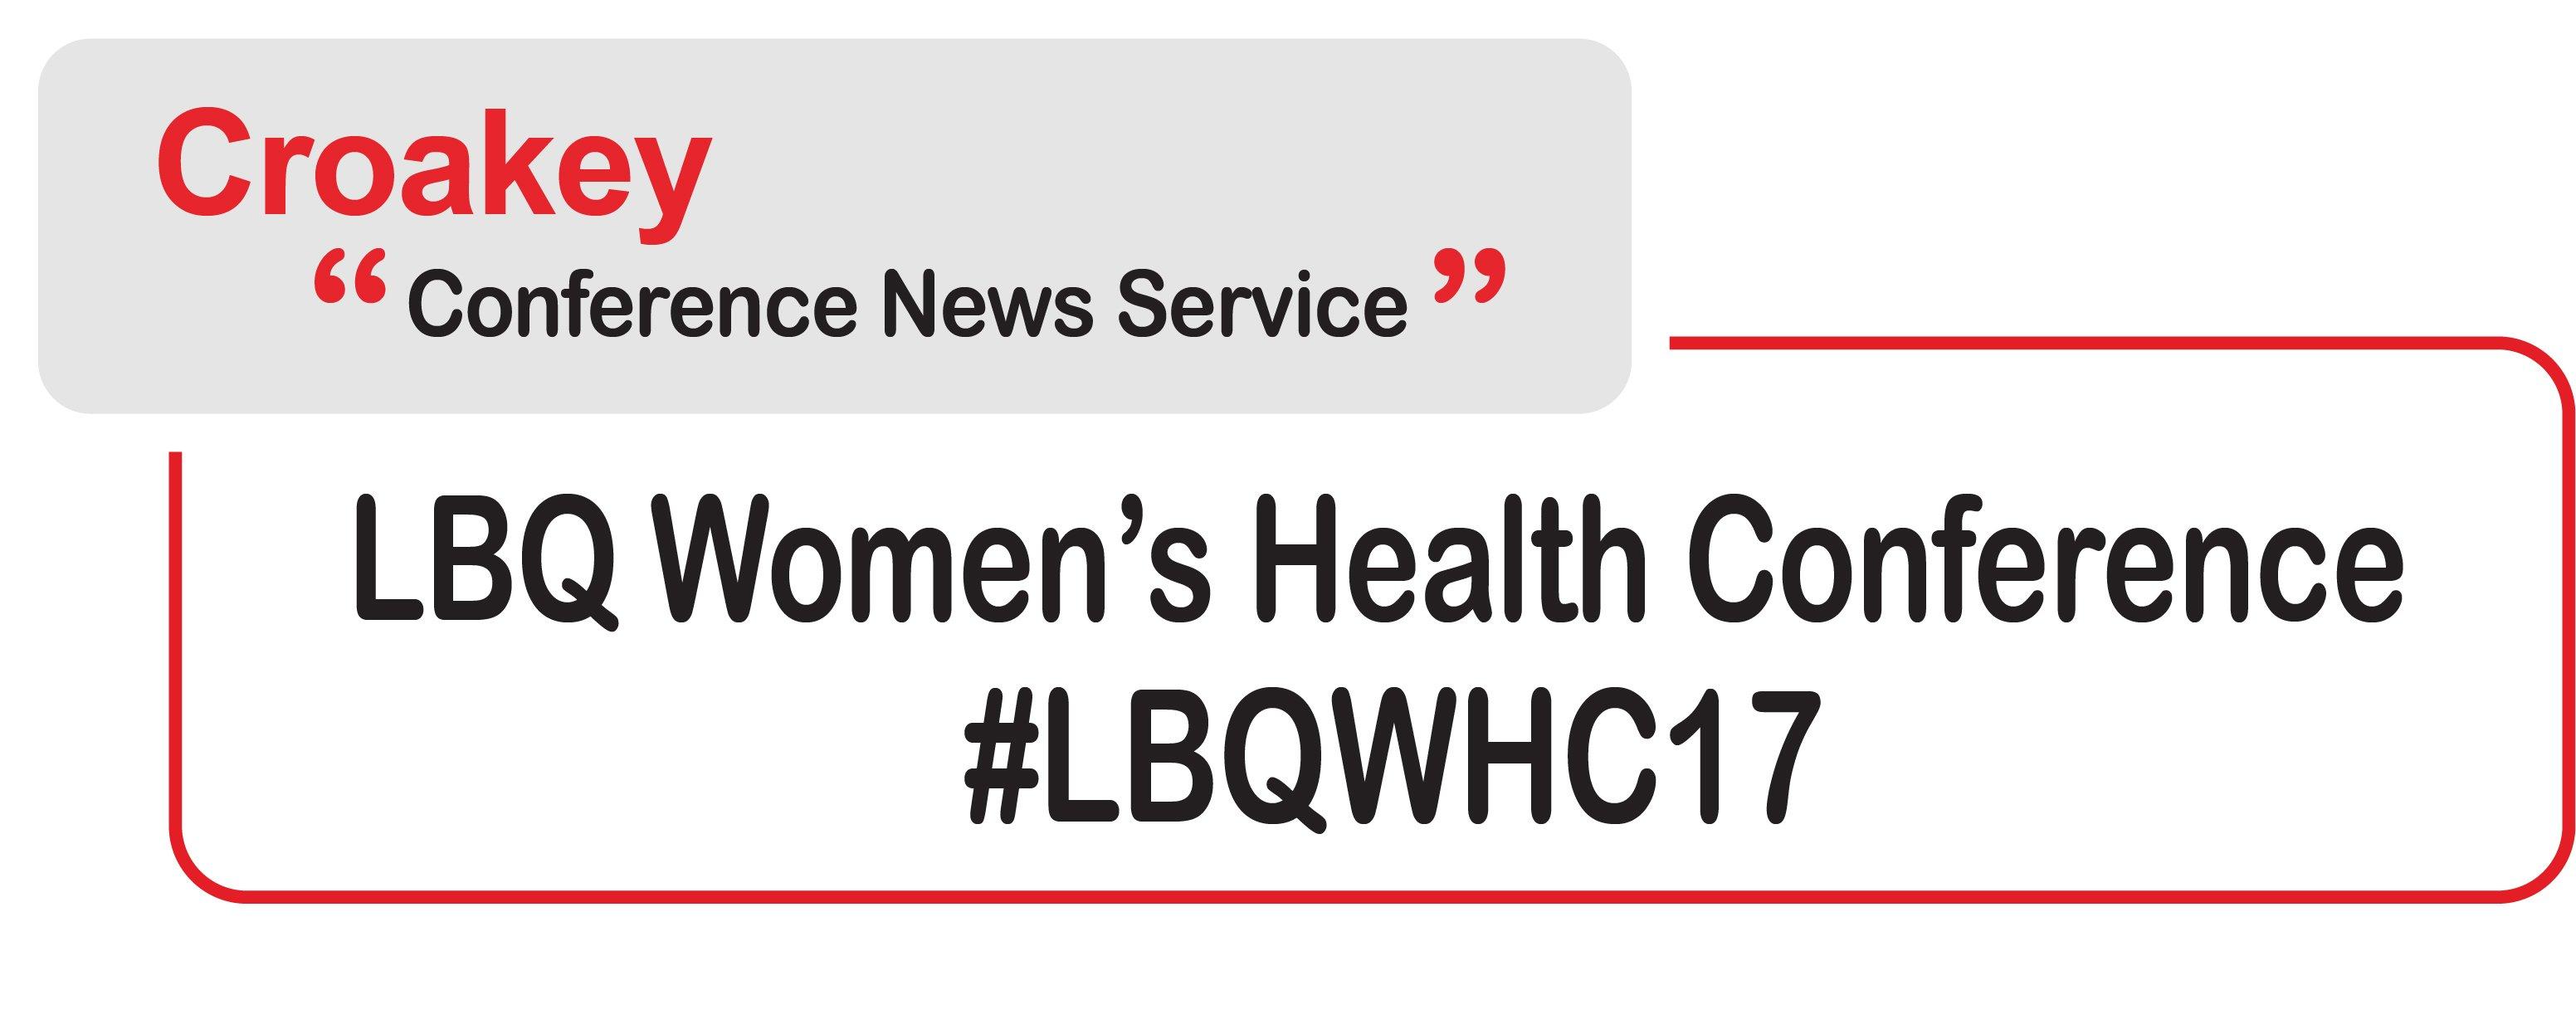 CCNS_LBQWomensHealth_logo